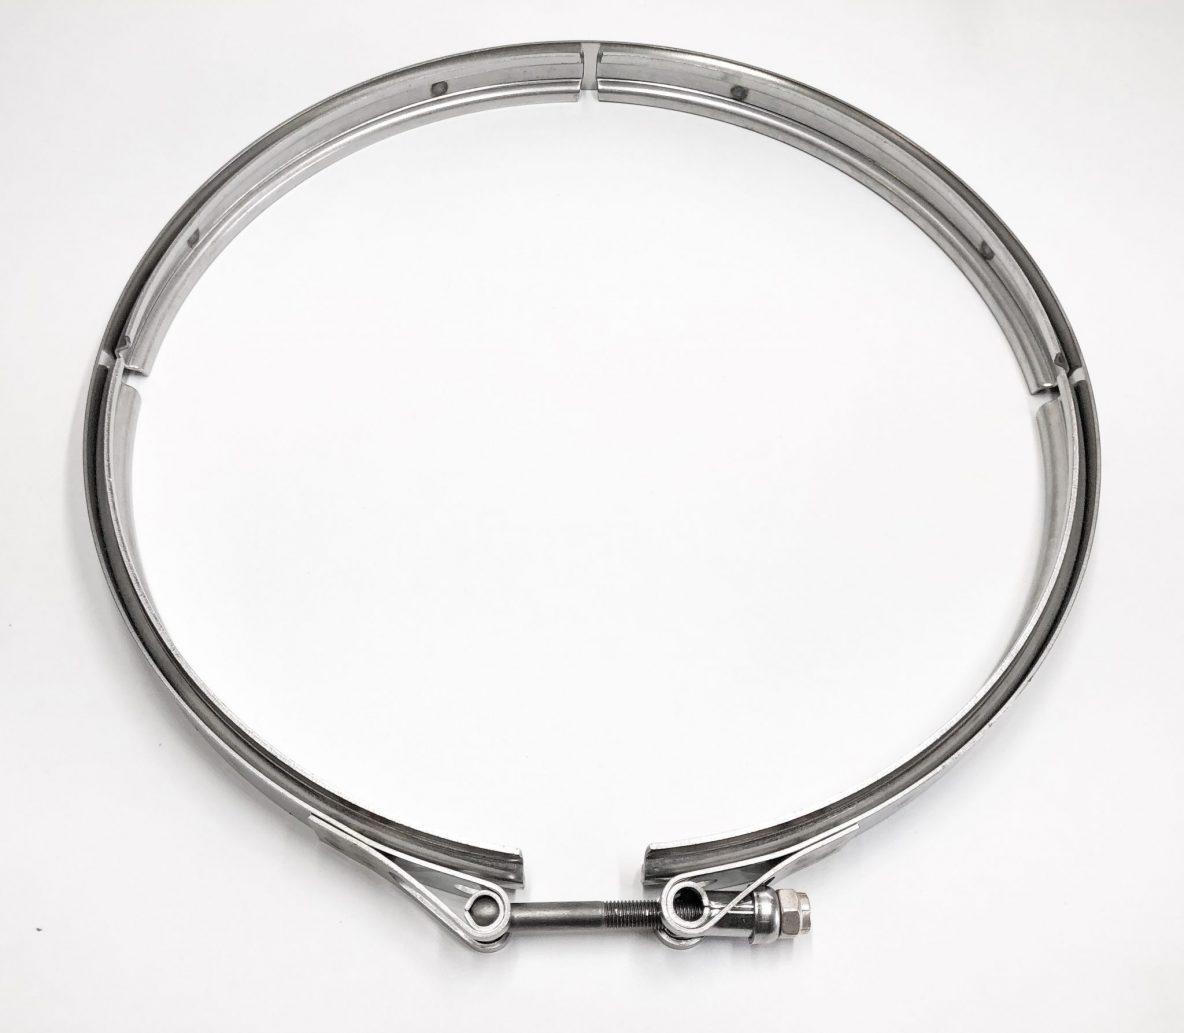 Cummins / Volvo / Detroit DPF V-Clamp OE Part 2871861 - ENV-CL-1051